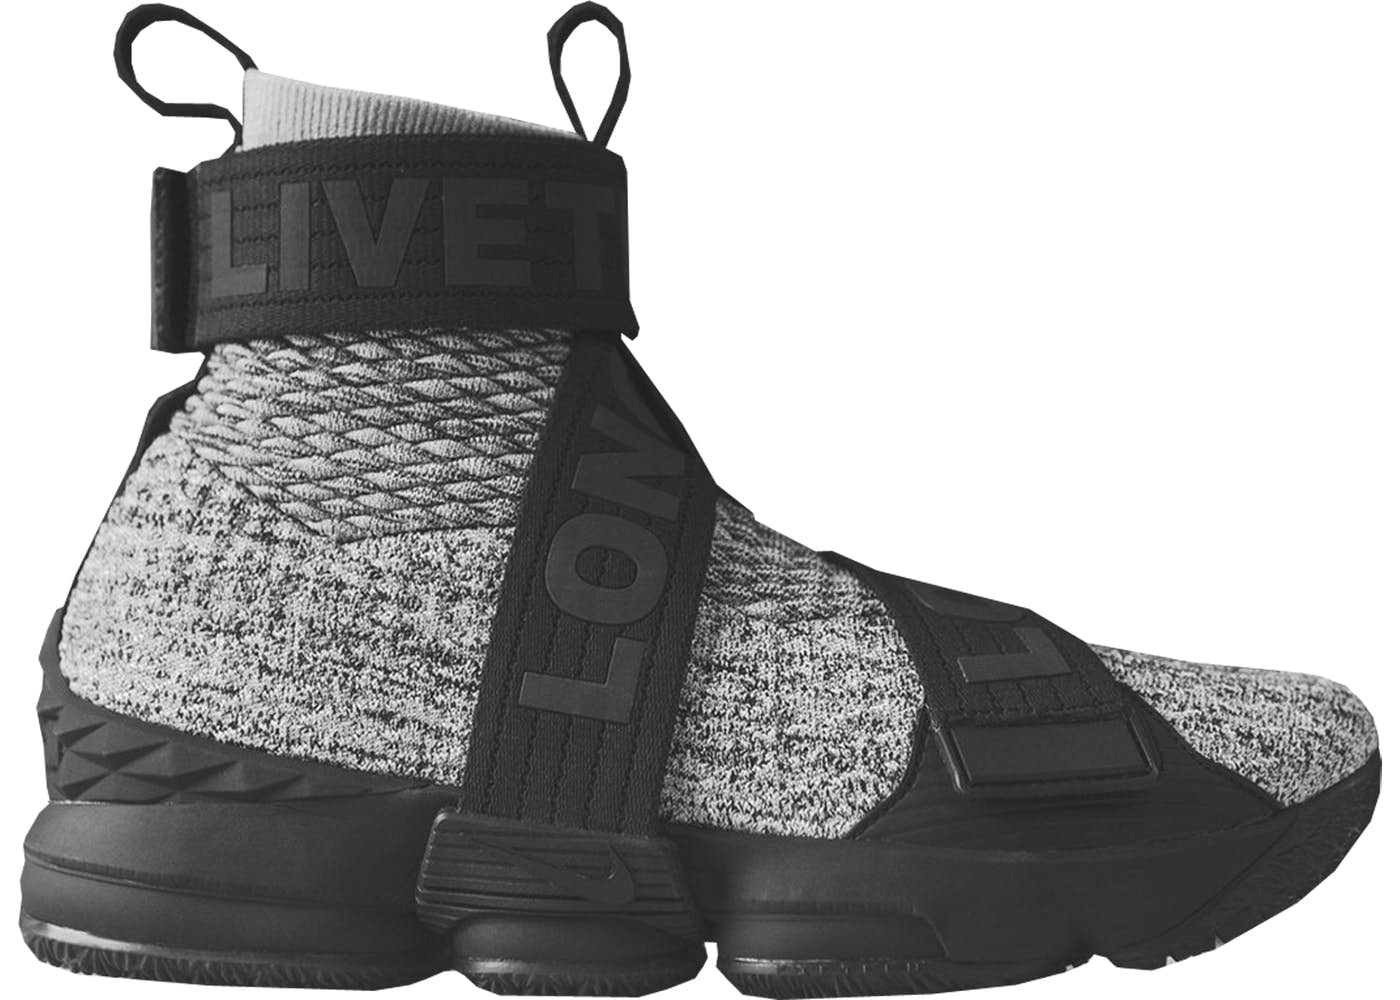 Lebron James Lifestyle Shoes White